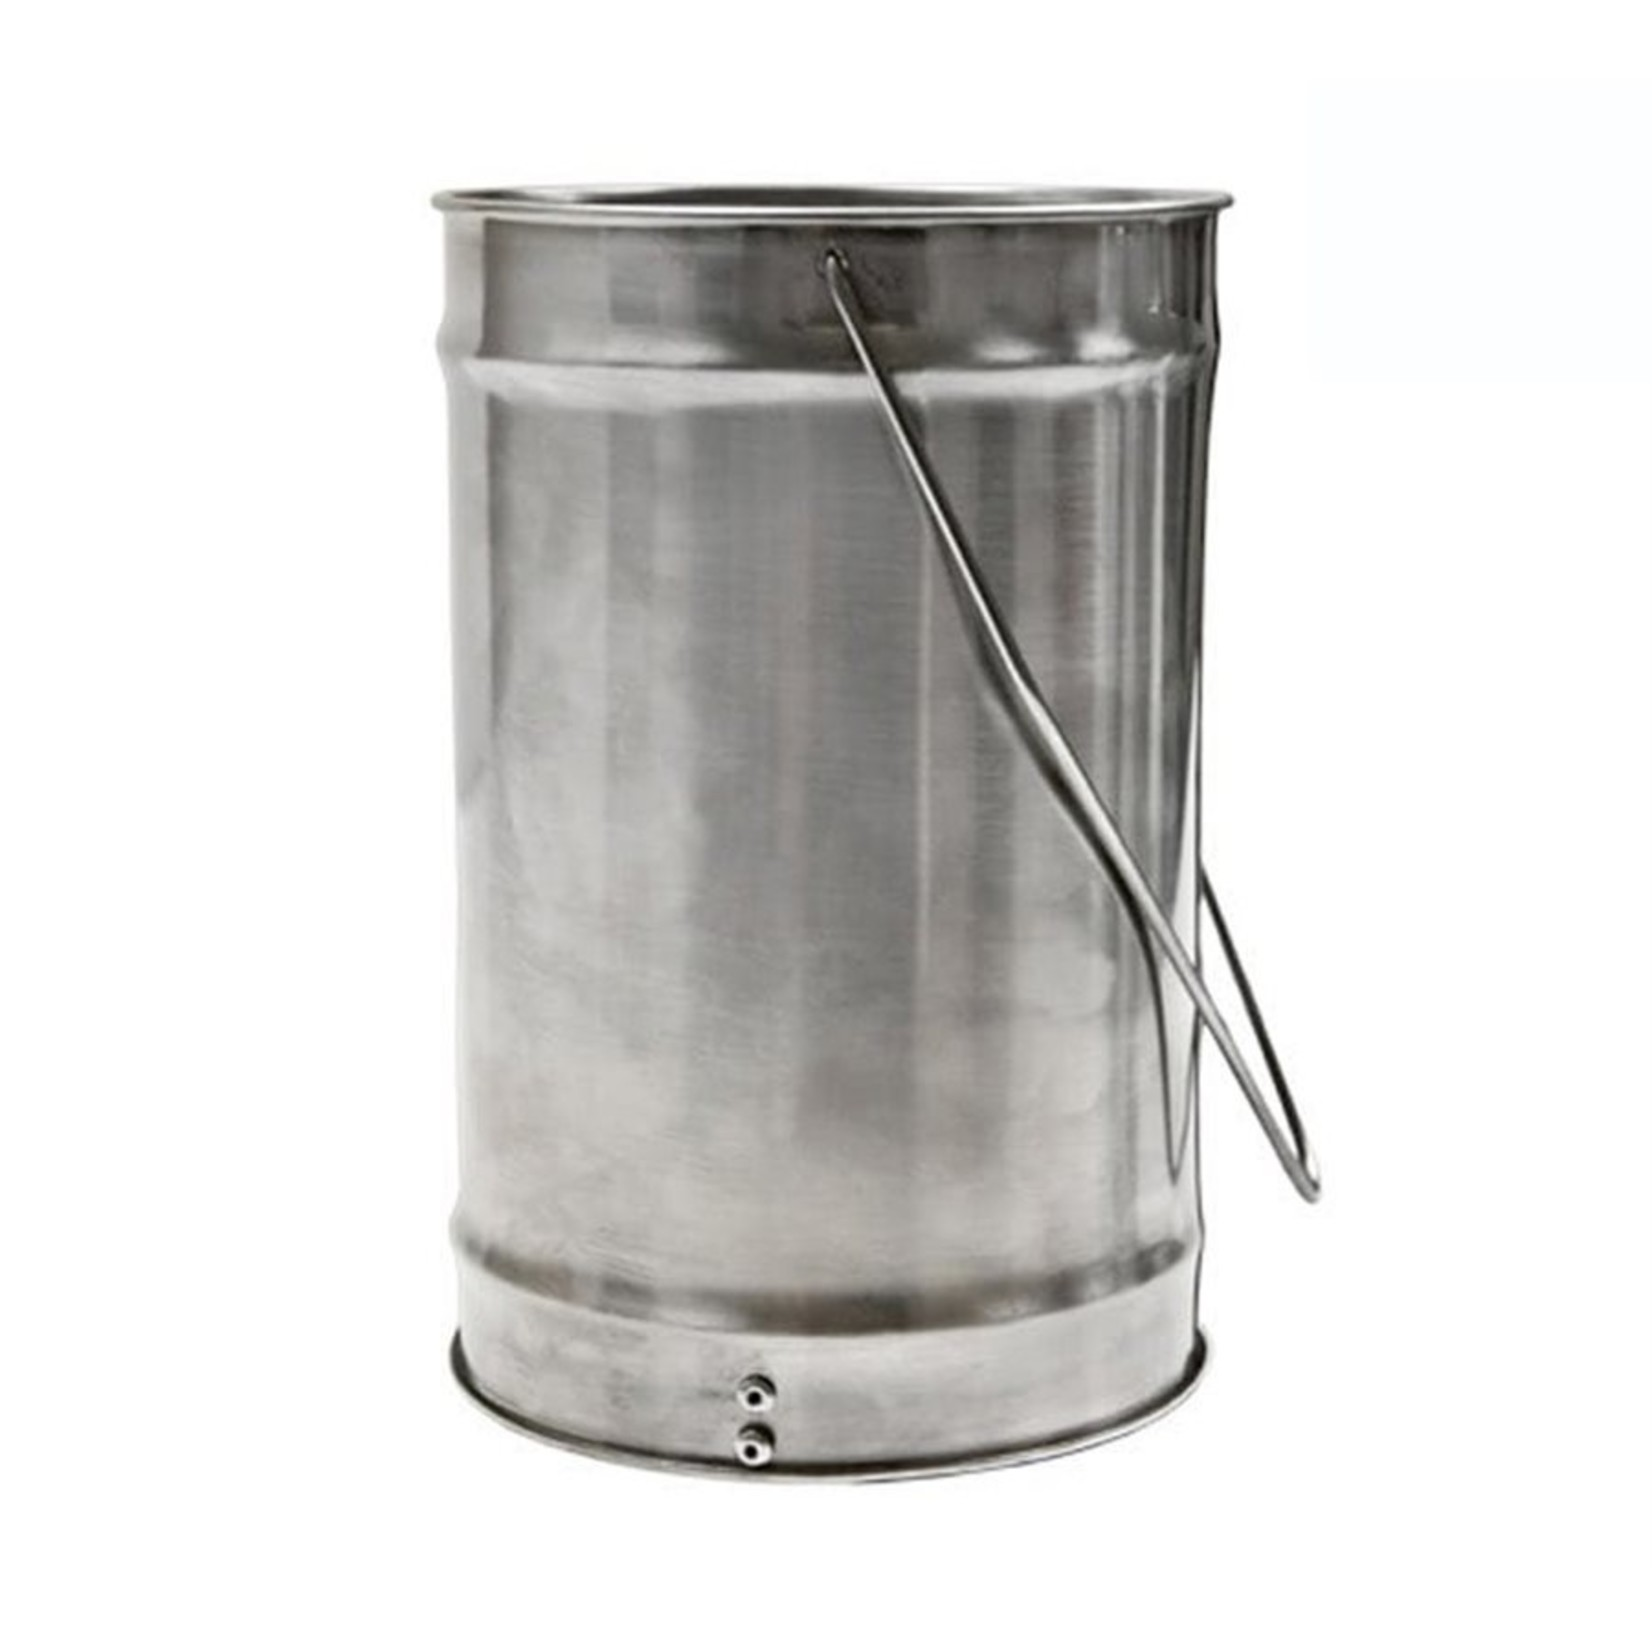 Sulfur Burner Greenhouse Vaporizer